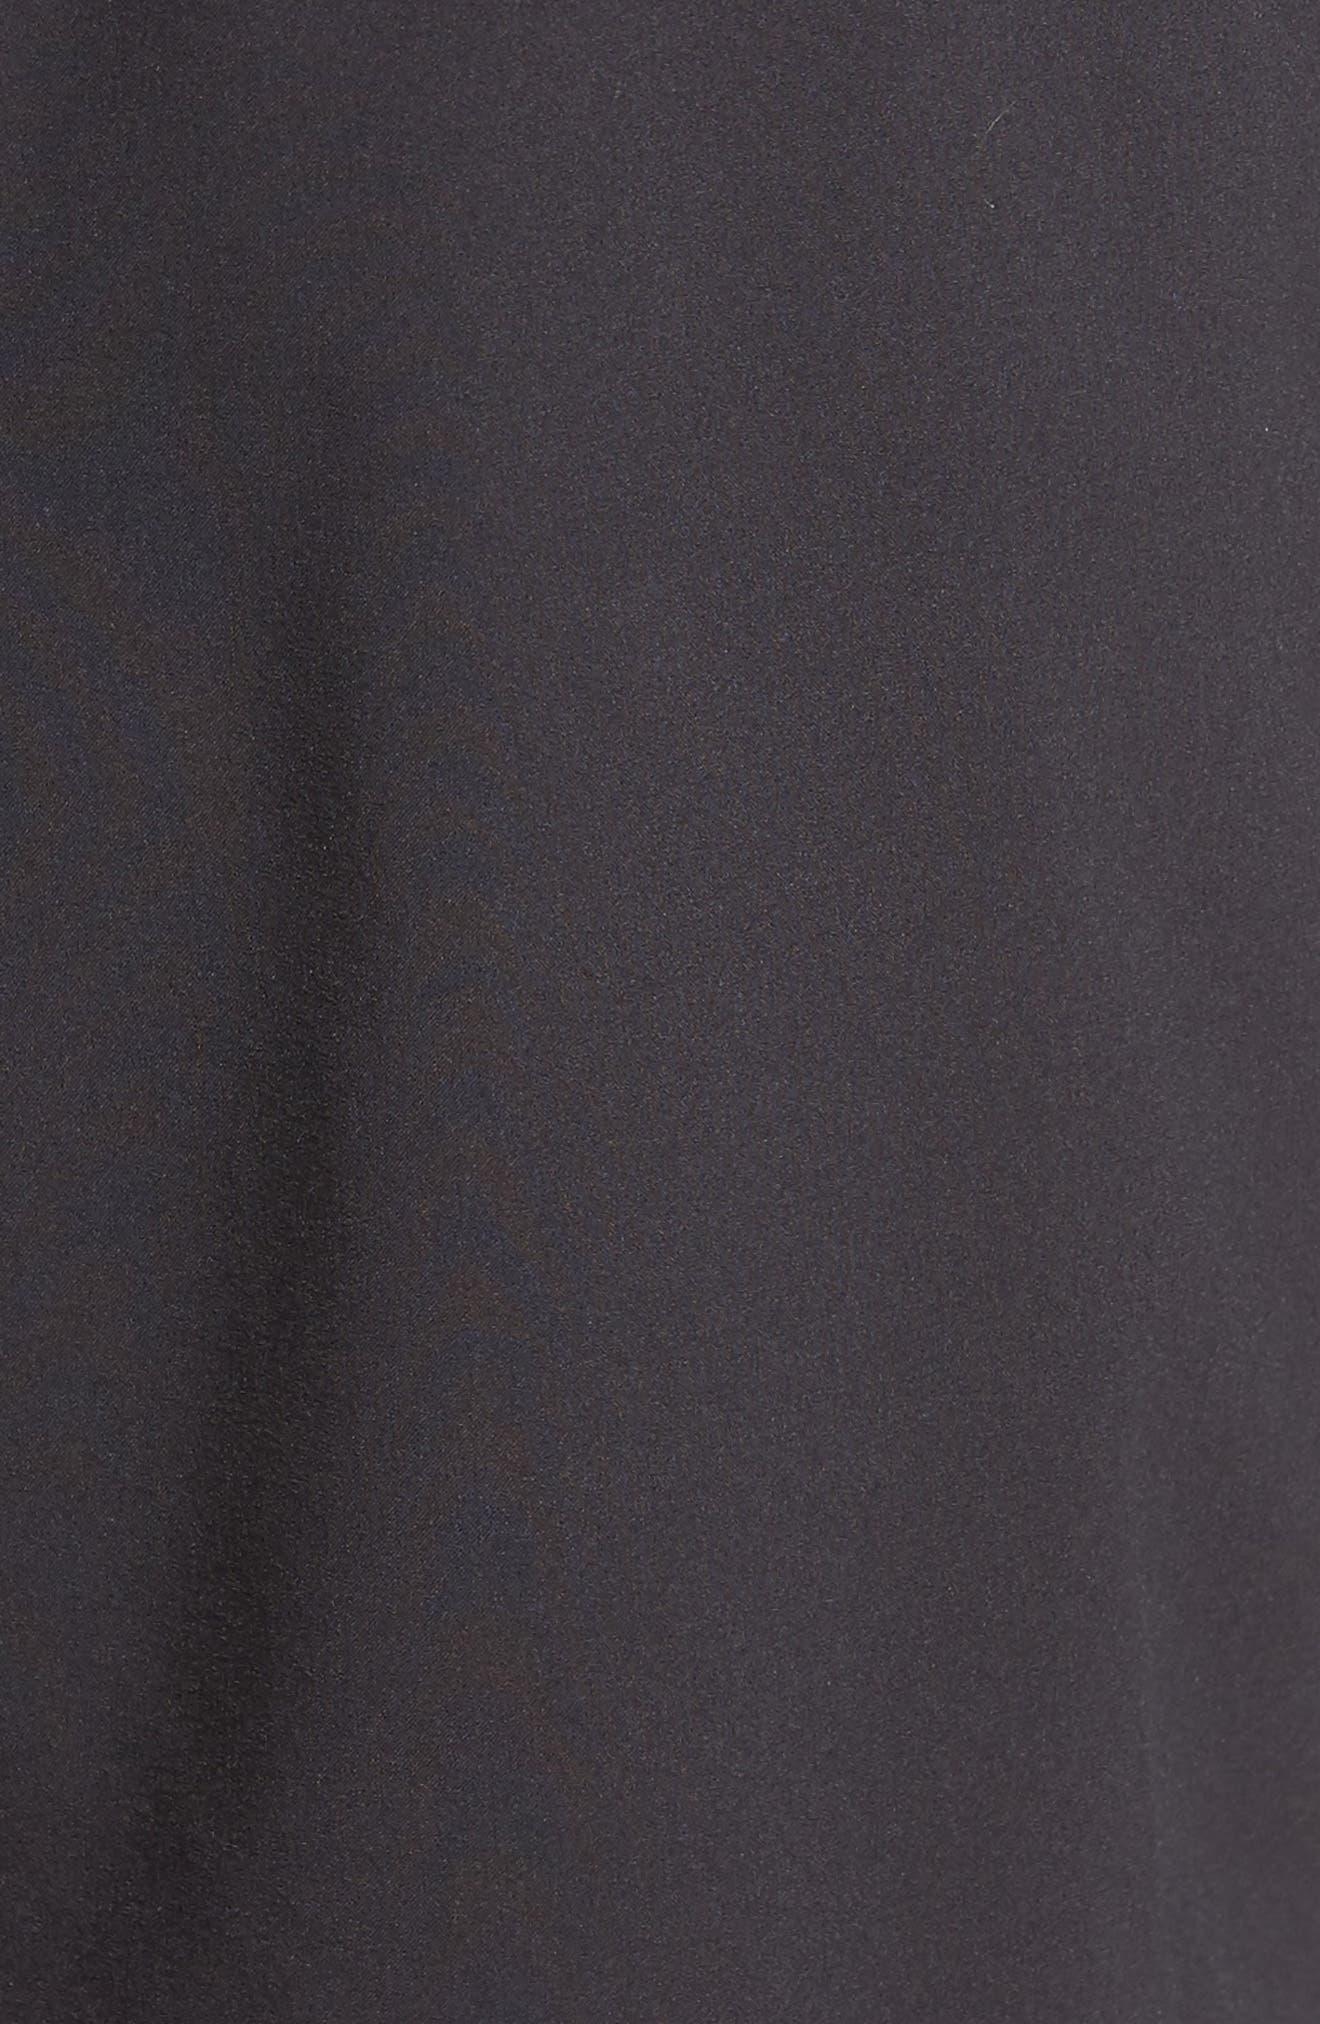 Propulsion Athletic Shorts,                             Alternate thumbnail 5, color,                             BLACK